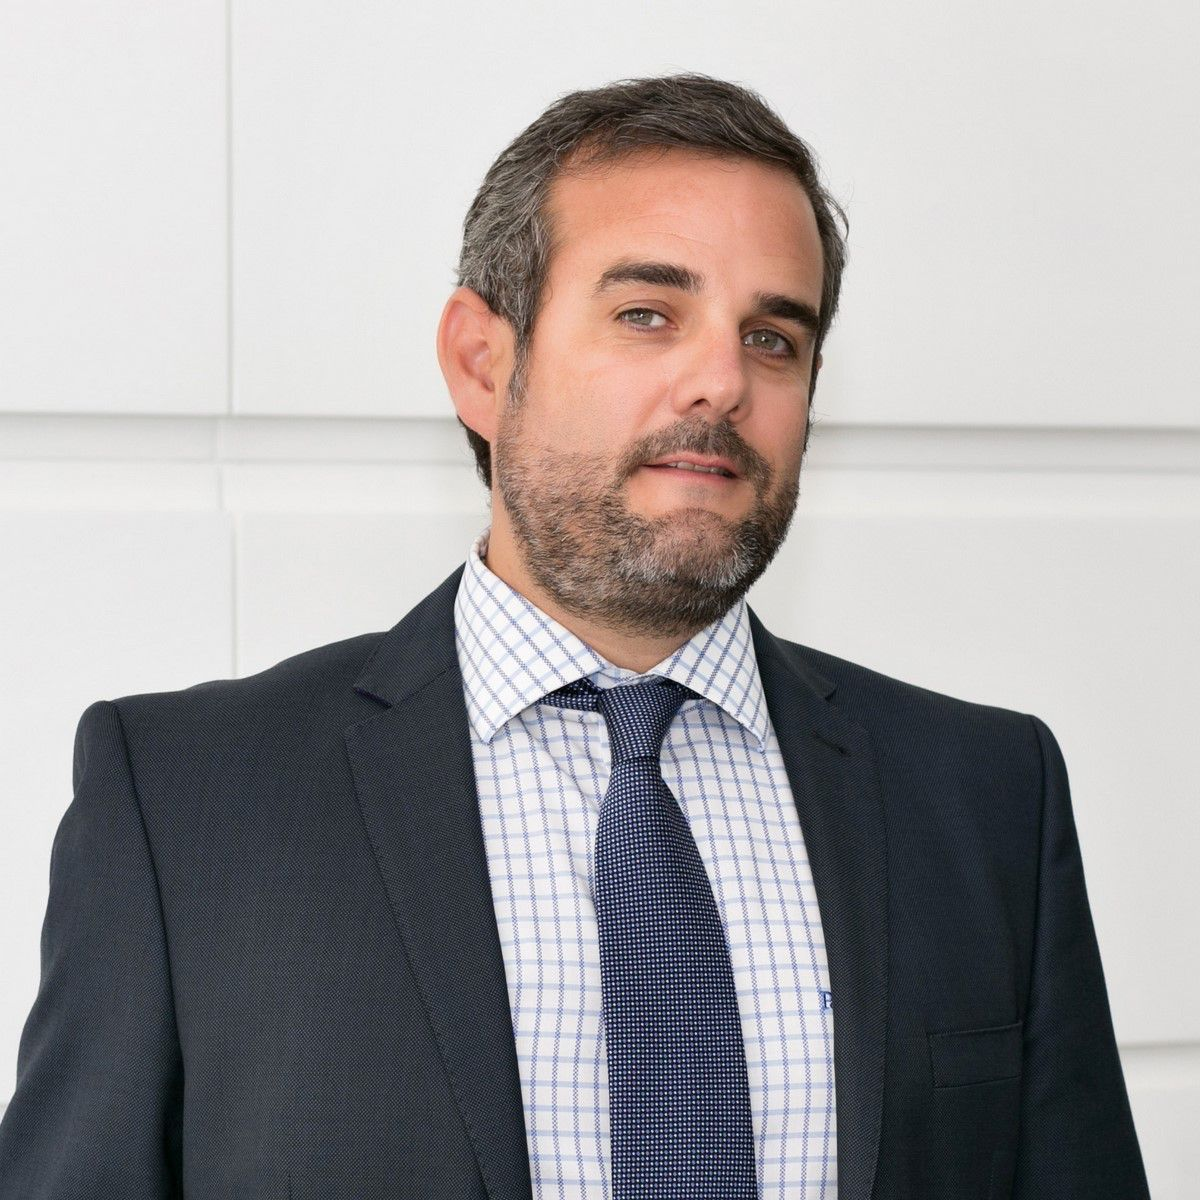 ALBERTO APRELL SANCHEZ